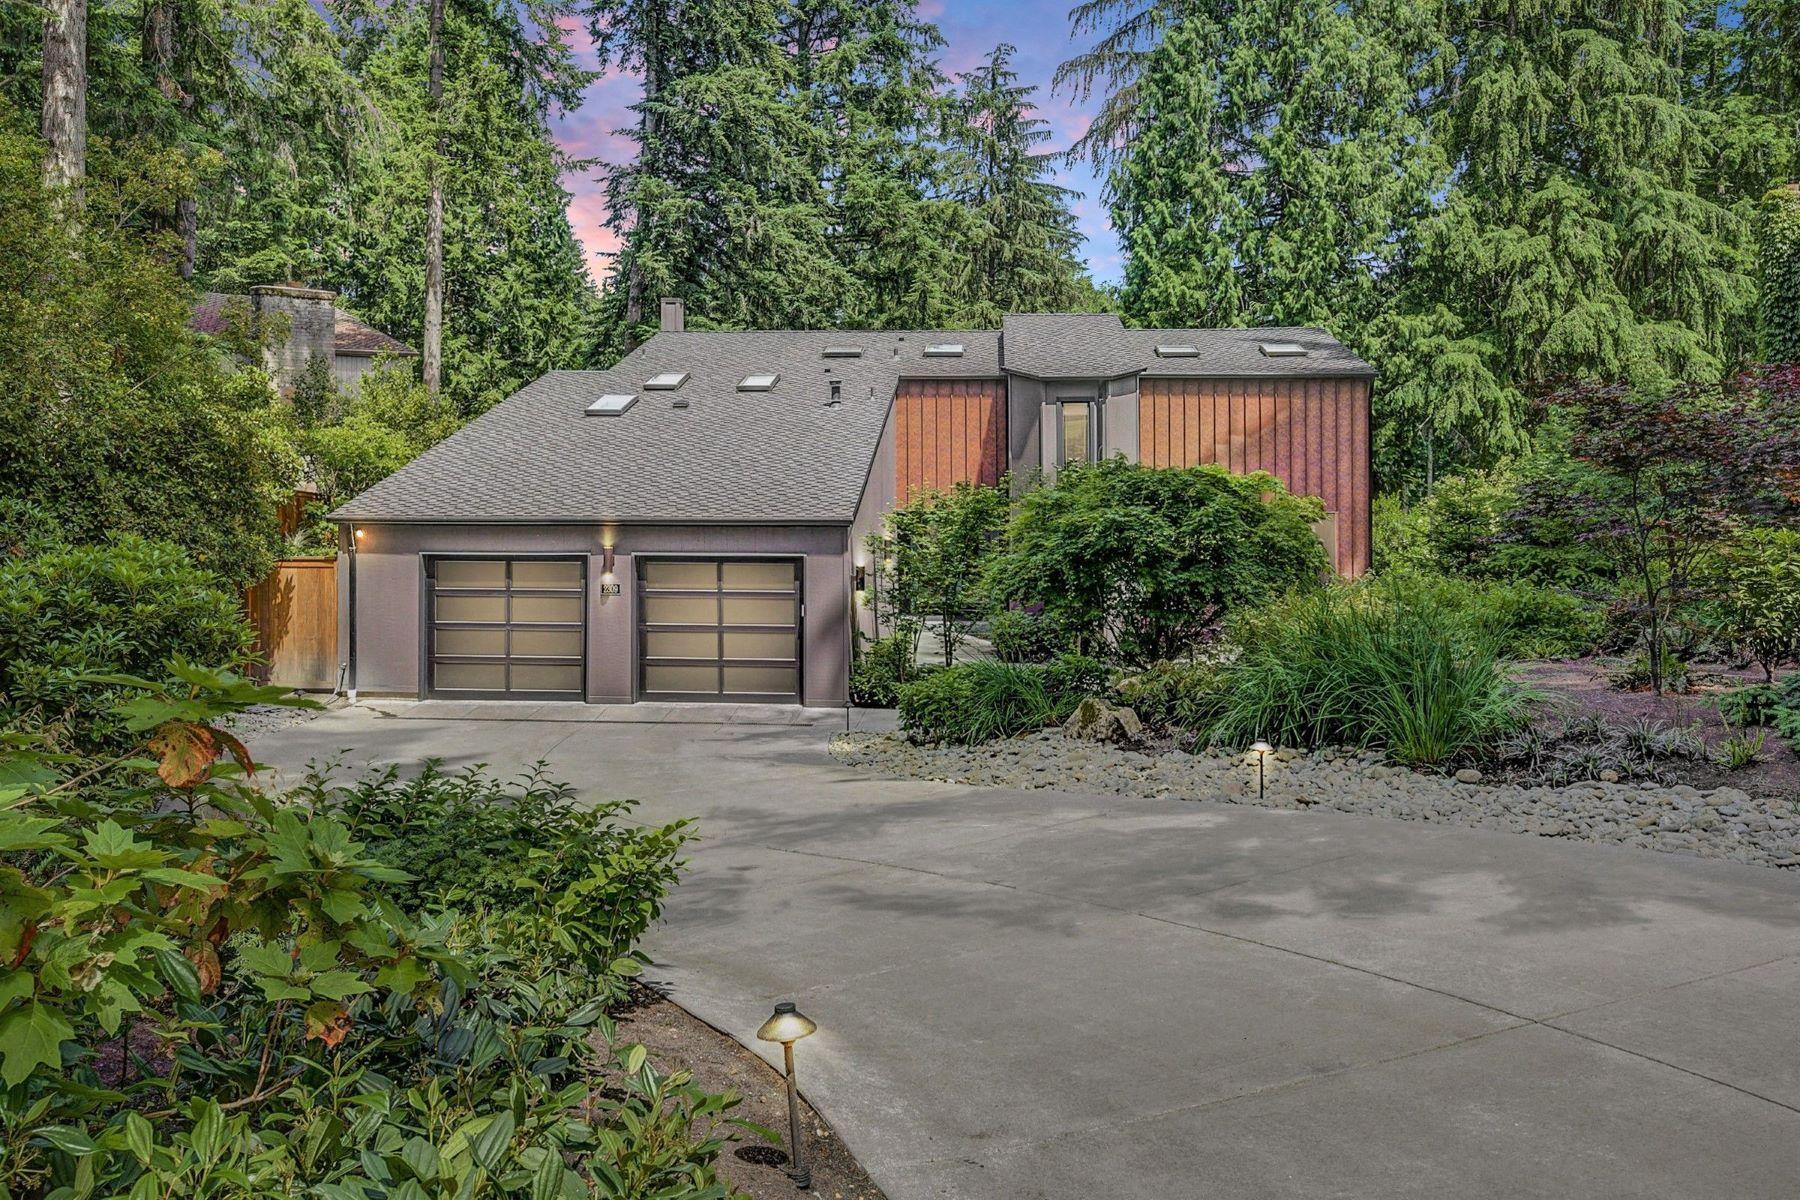 Single Family Homes για την Πώληση στο 2309 Sahalee Drive East, Sammamish, WA 98074 2309 Sahalee Dr E, Sammamish, Ουασινγκτον 98074 Ηνωμένες Πολιτείες